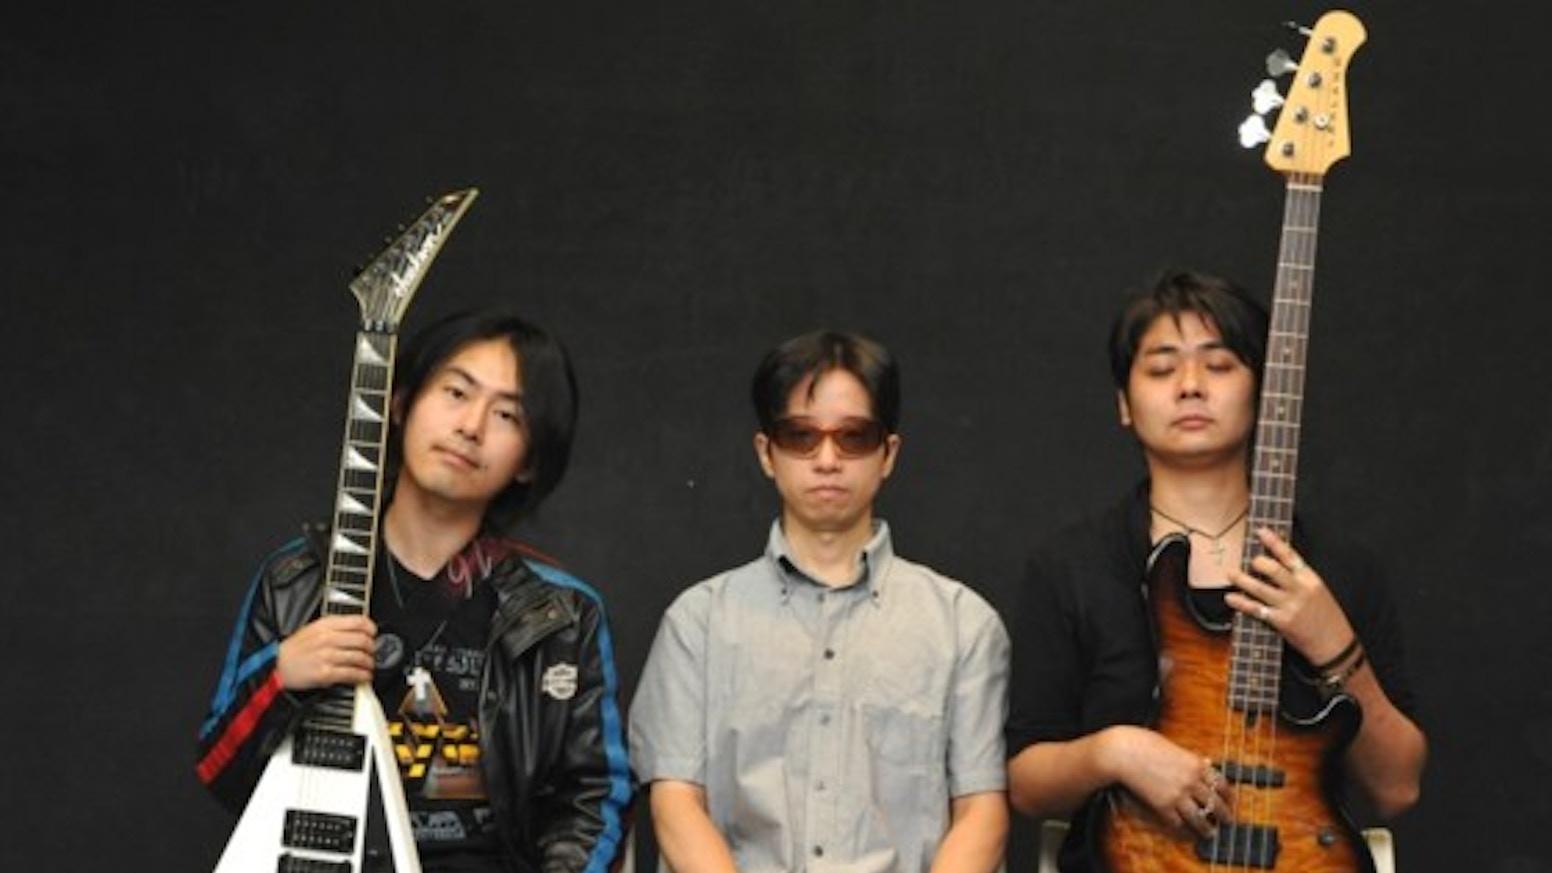 japanese christian rock to tour usa by imari tones kickstarter. Black Bedroom Furniture Sets. Home Design Ideas